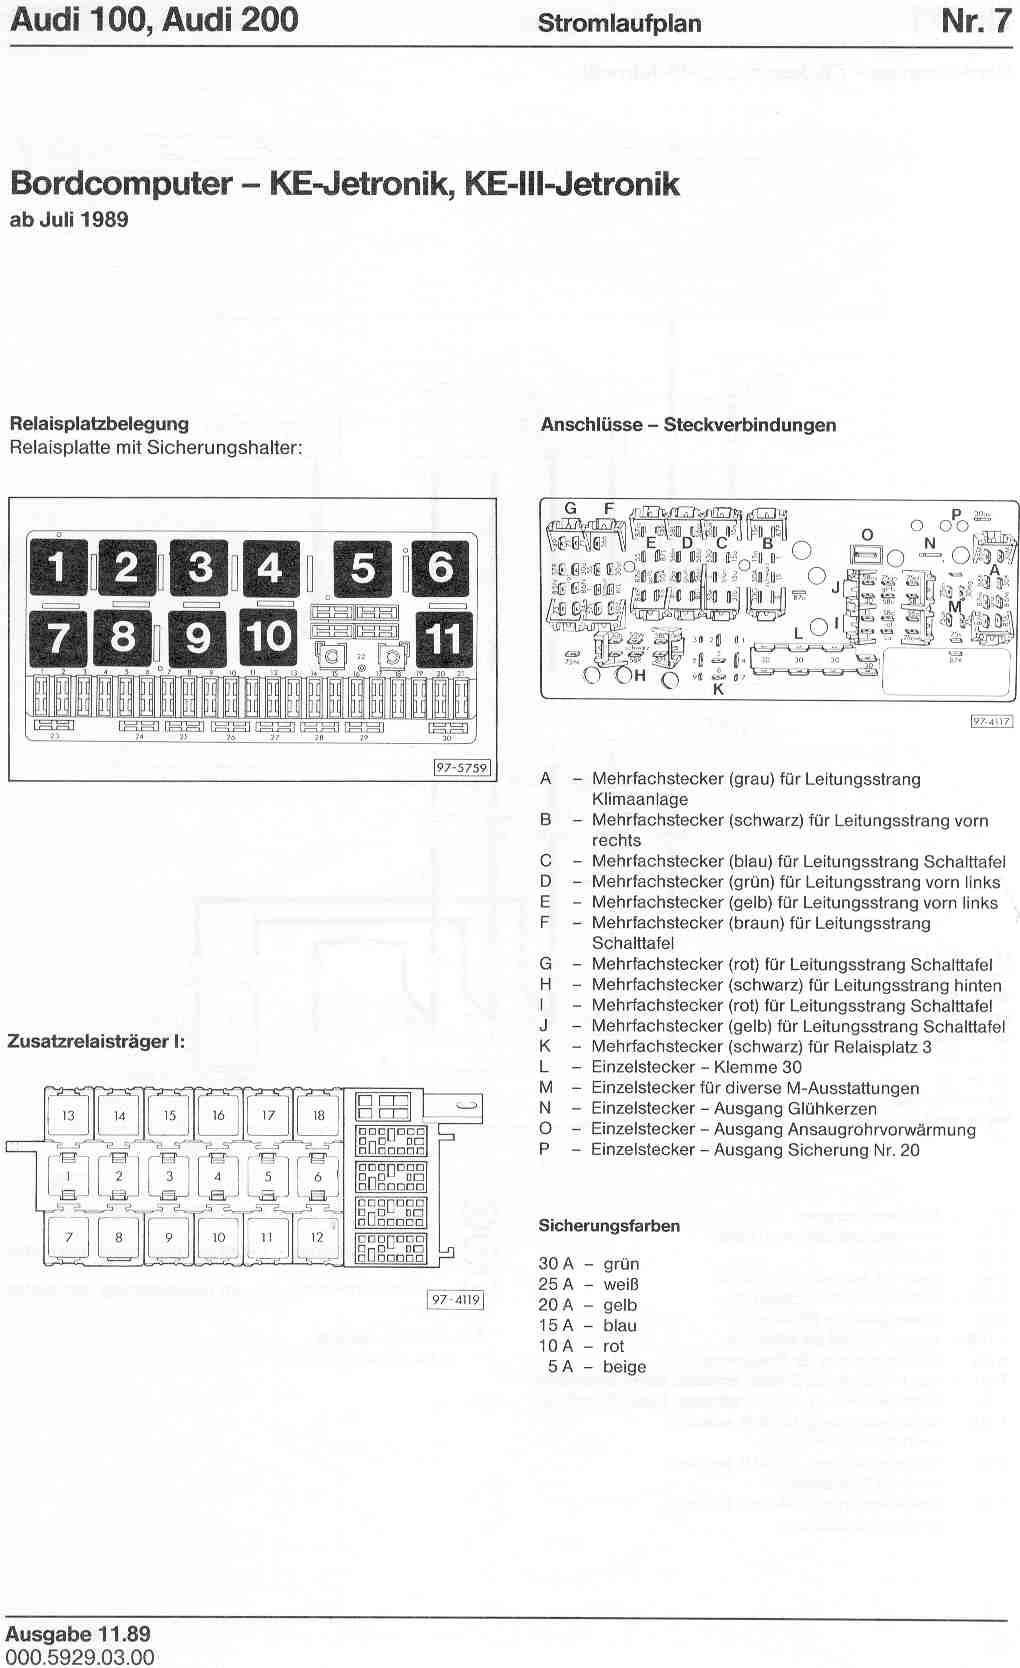 Audi 100/200 Factory Wiring Diagramswww.sizov.org